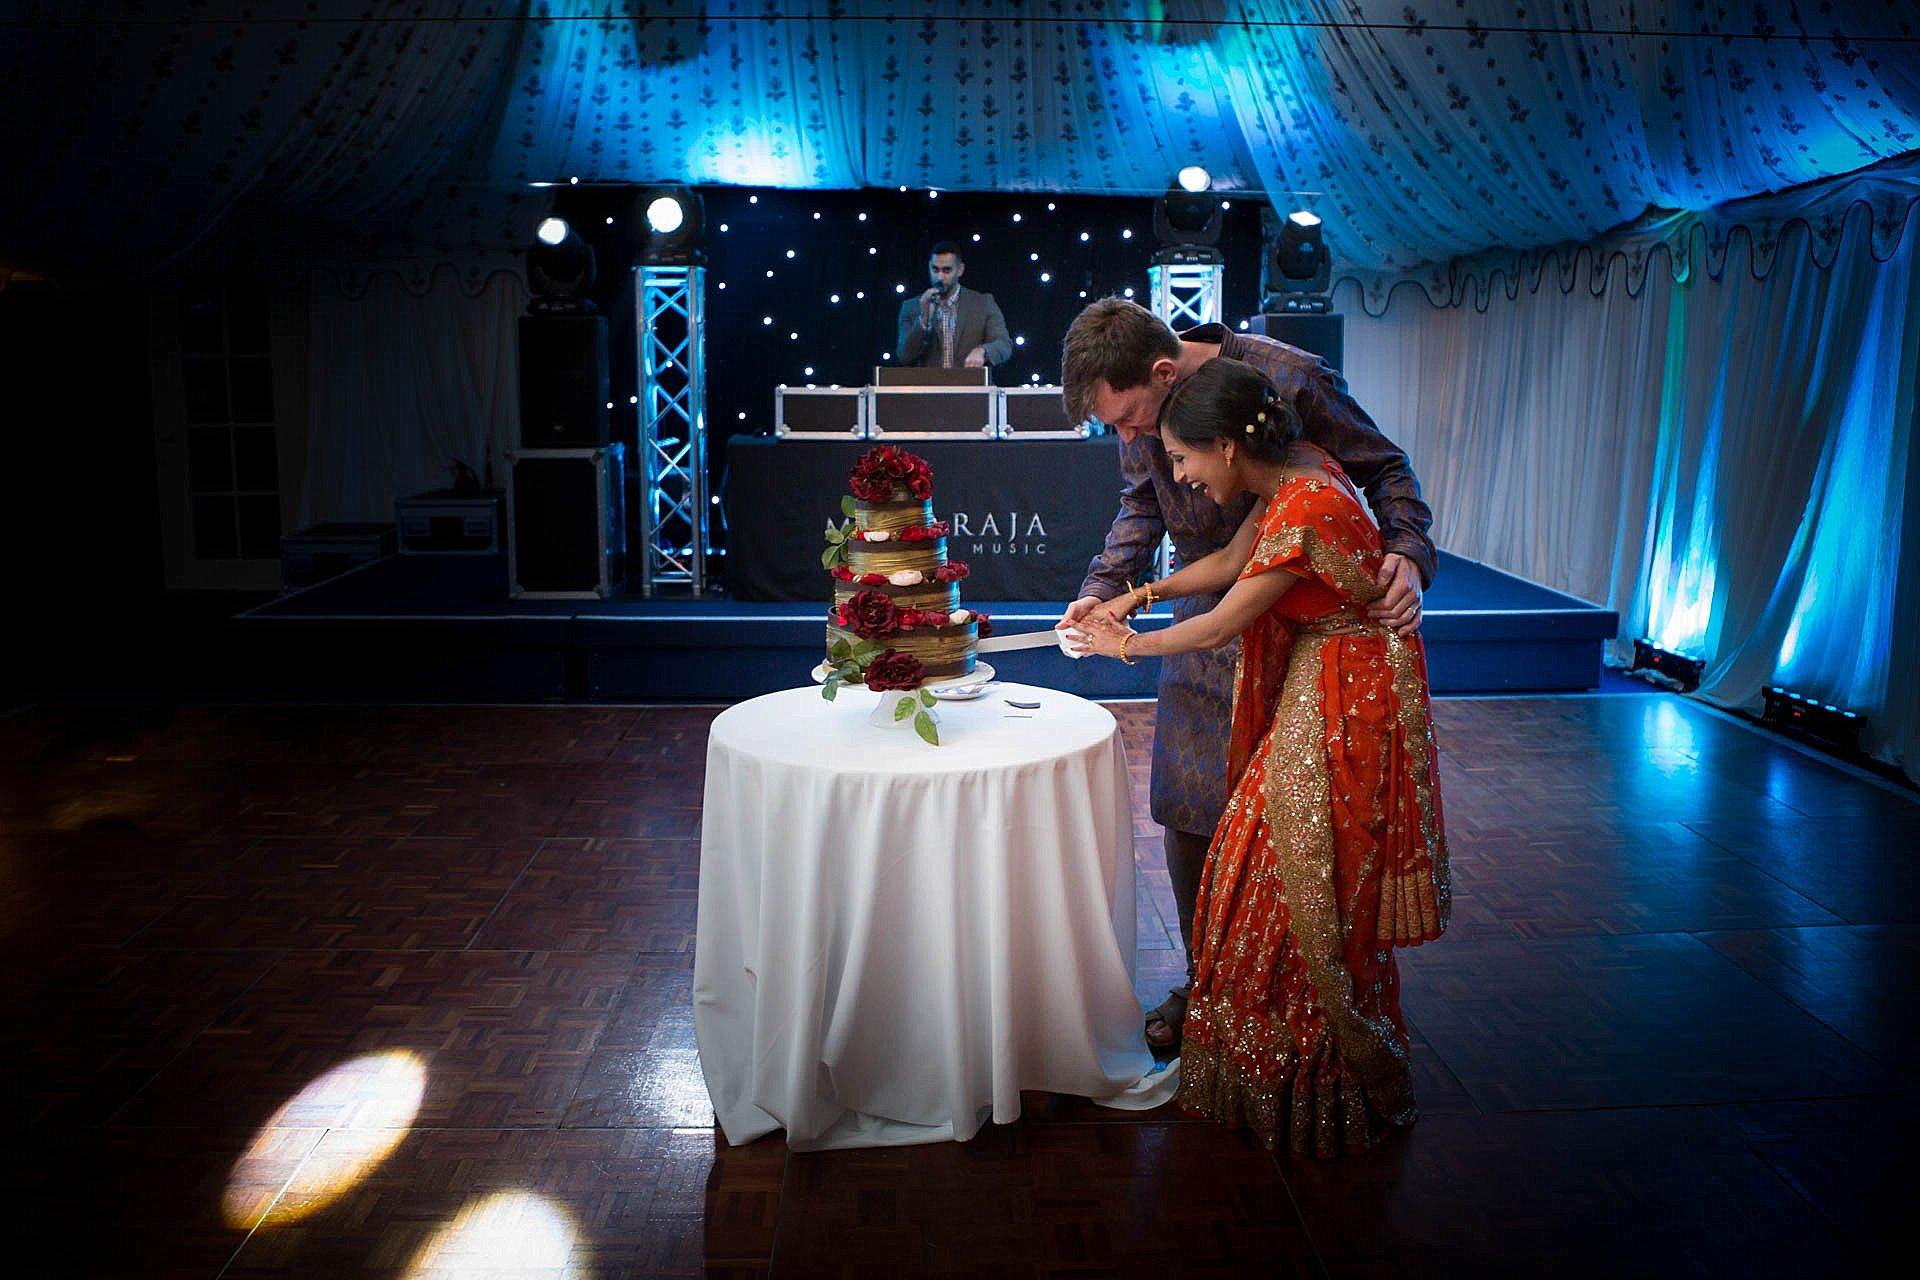 Poundon House - Cutting the cake